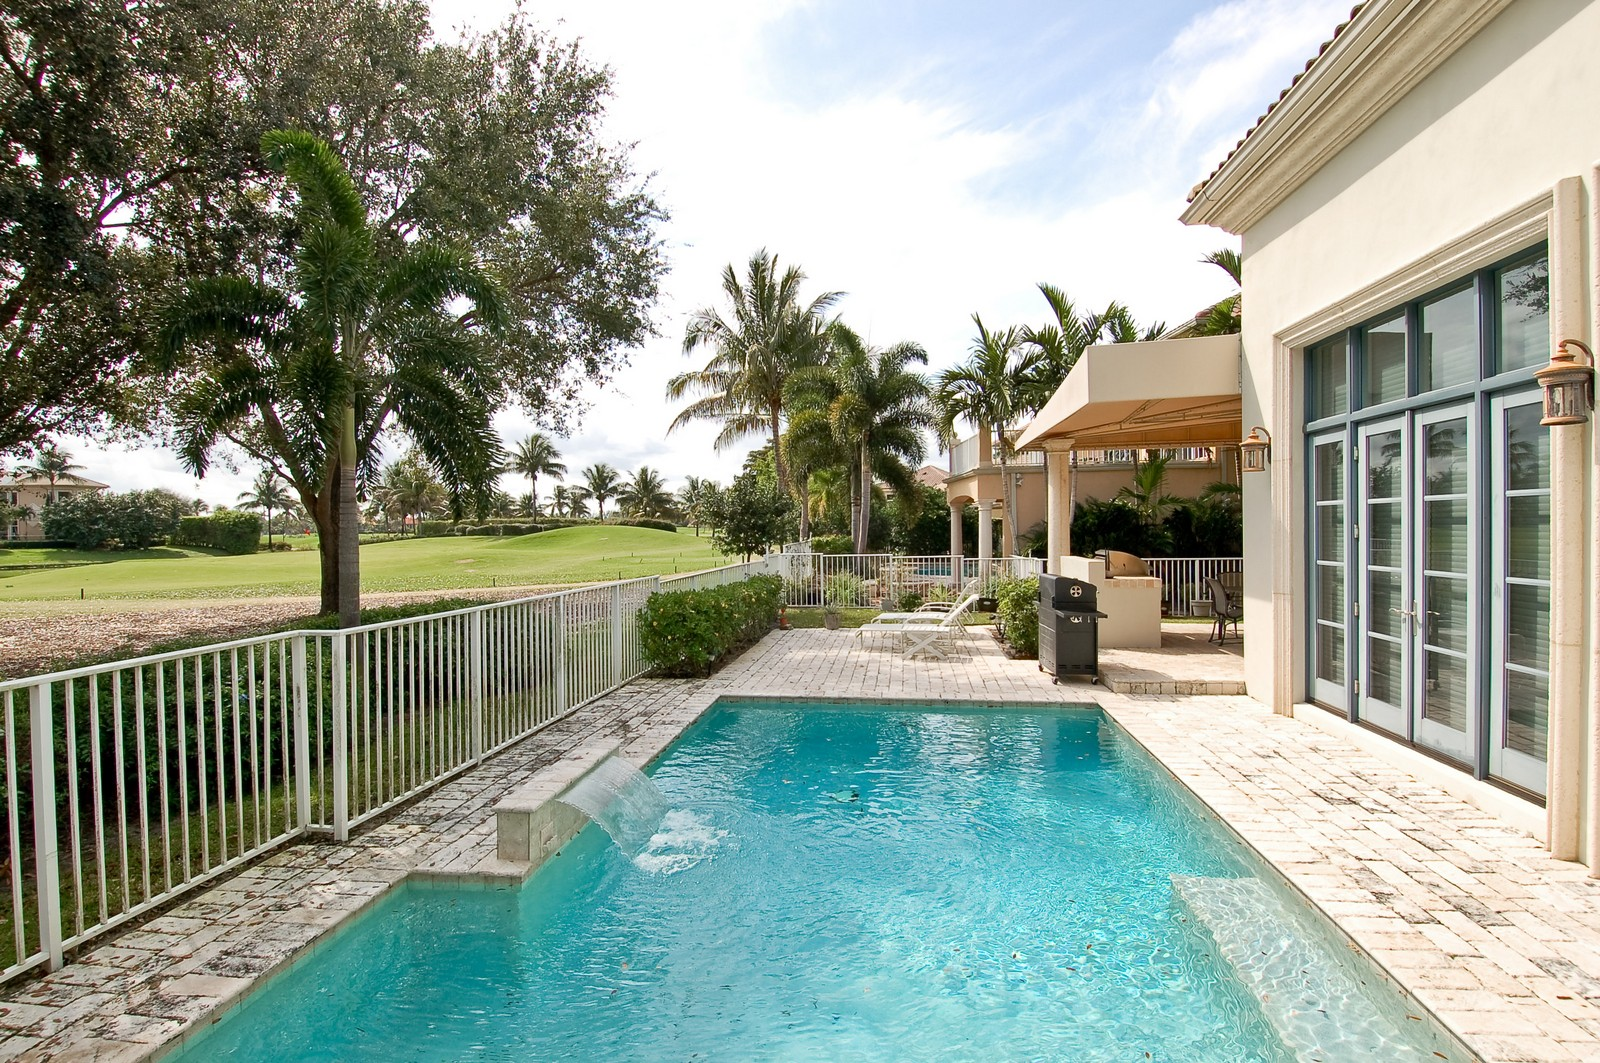 Real Estate Photography - 7478 Valencia Dr, Boca Raton, FL, 33433 - Pool